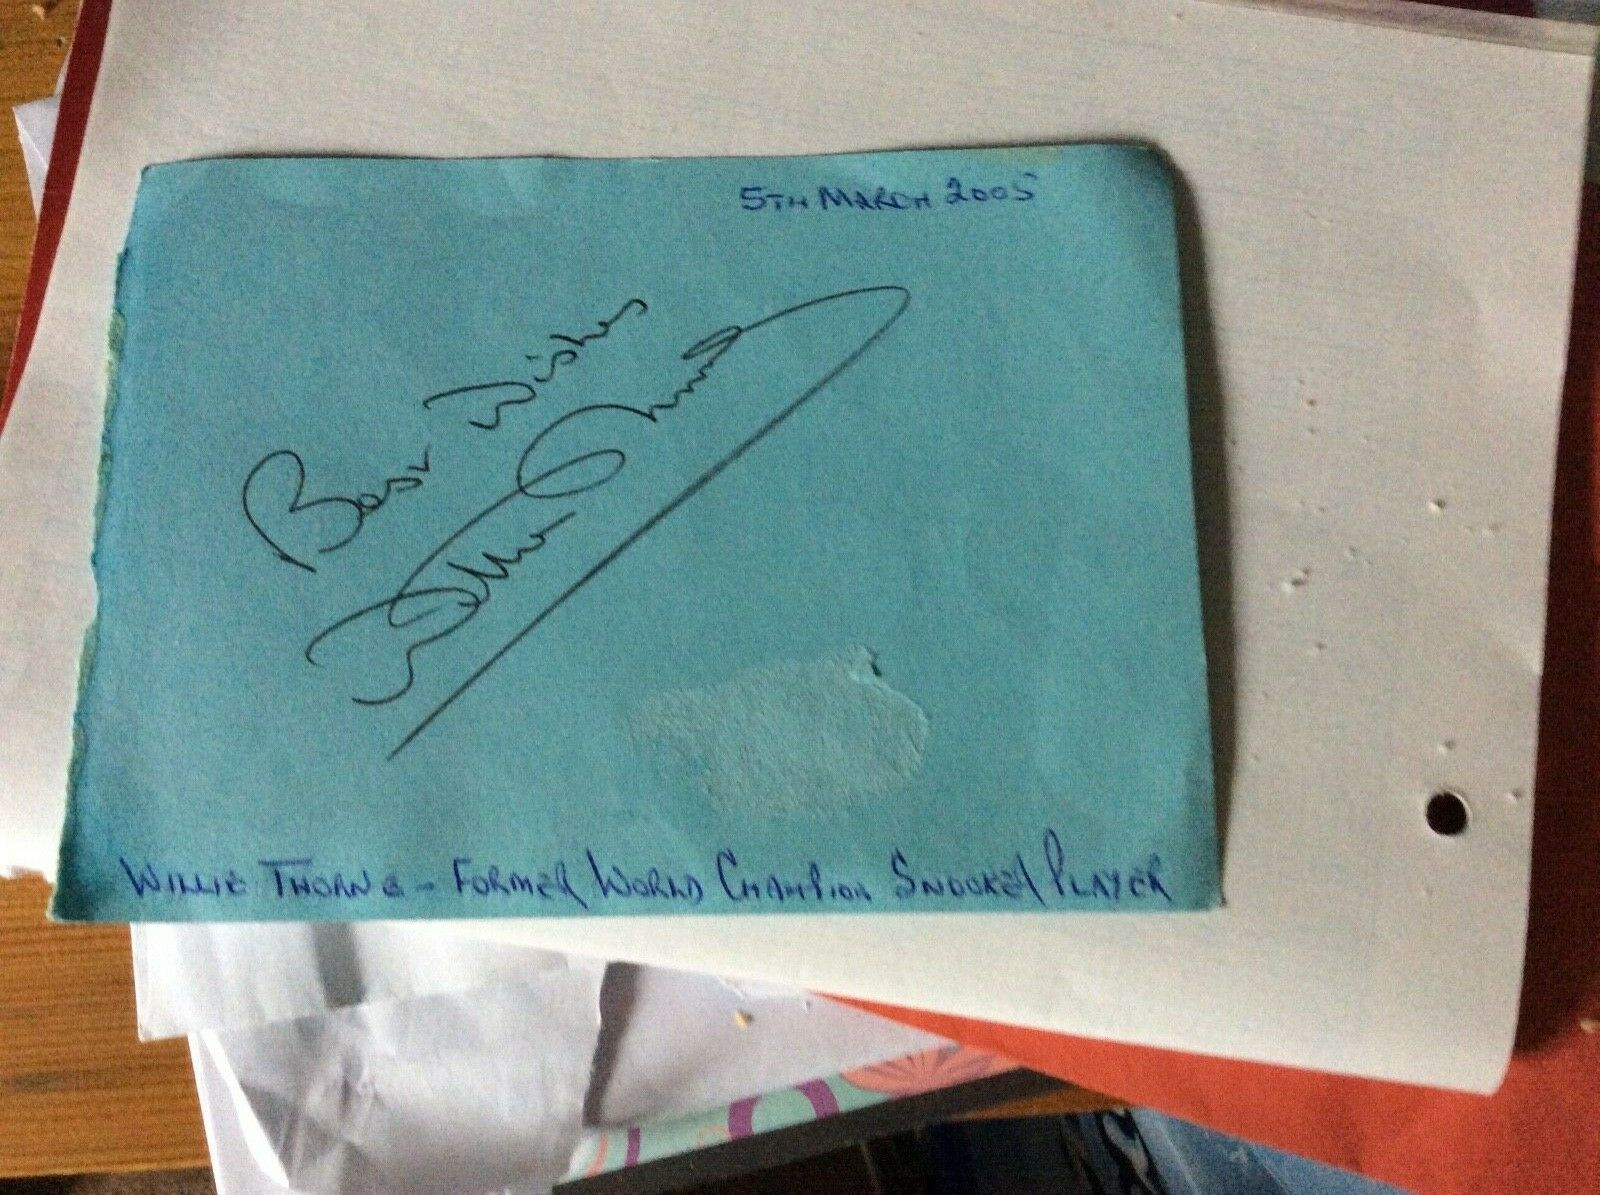 Willie Thorne Autograph